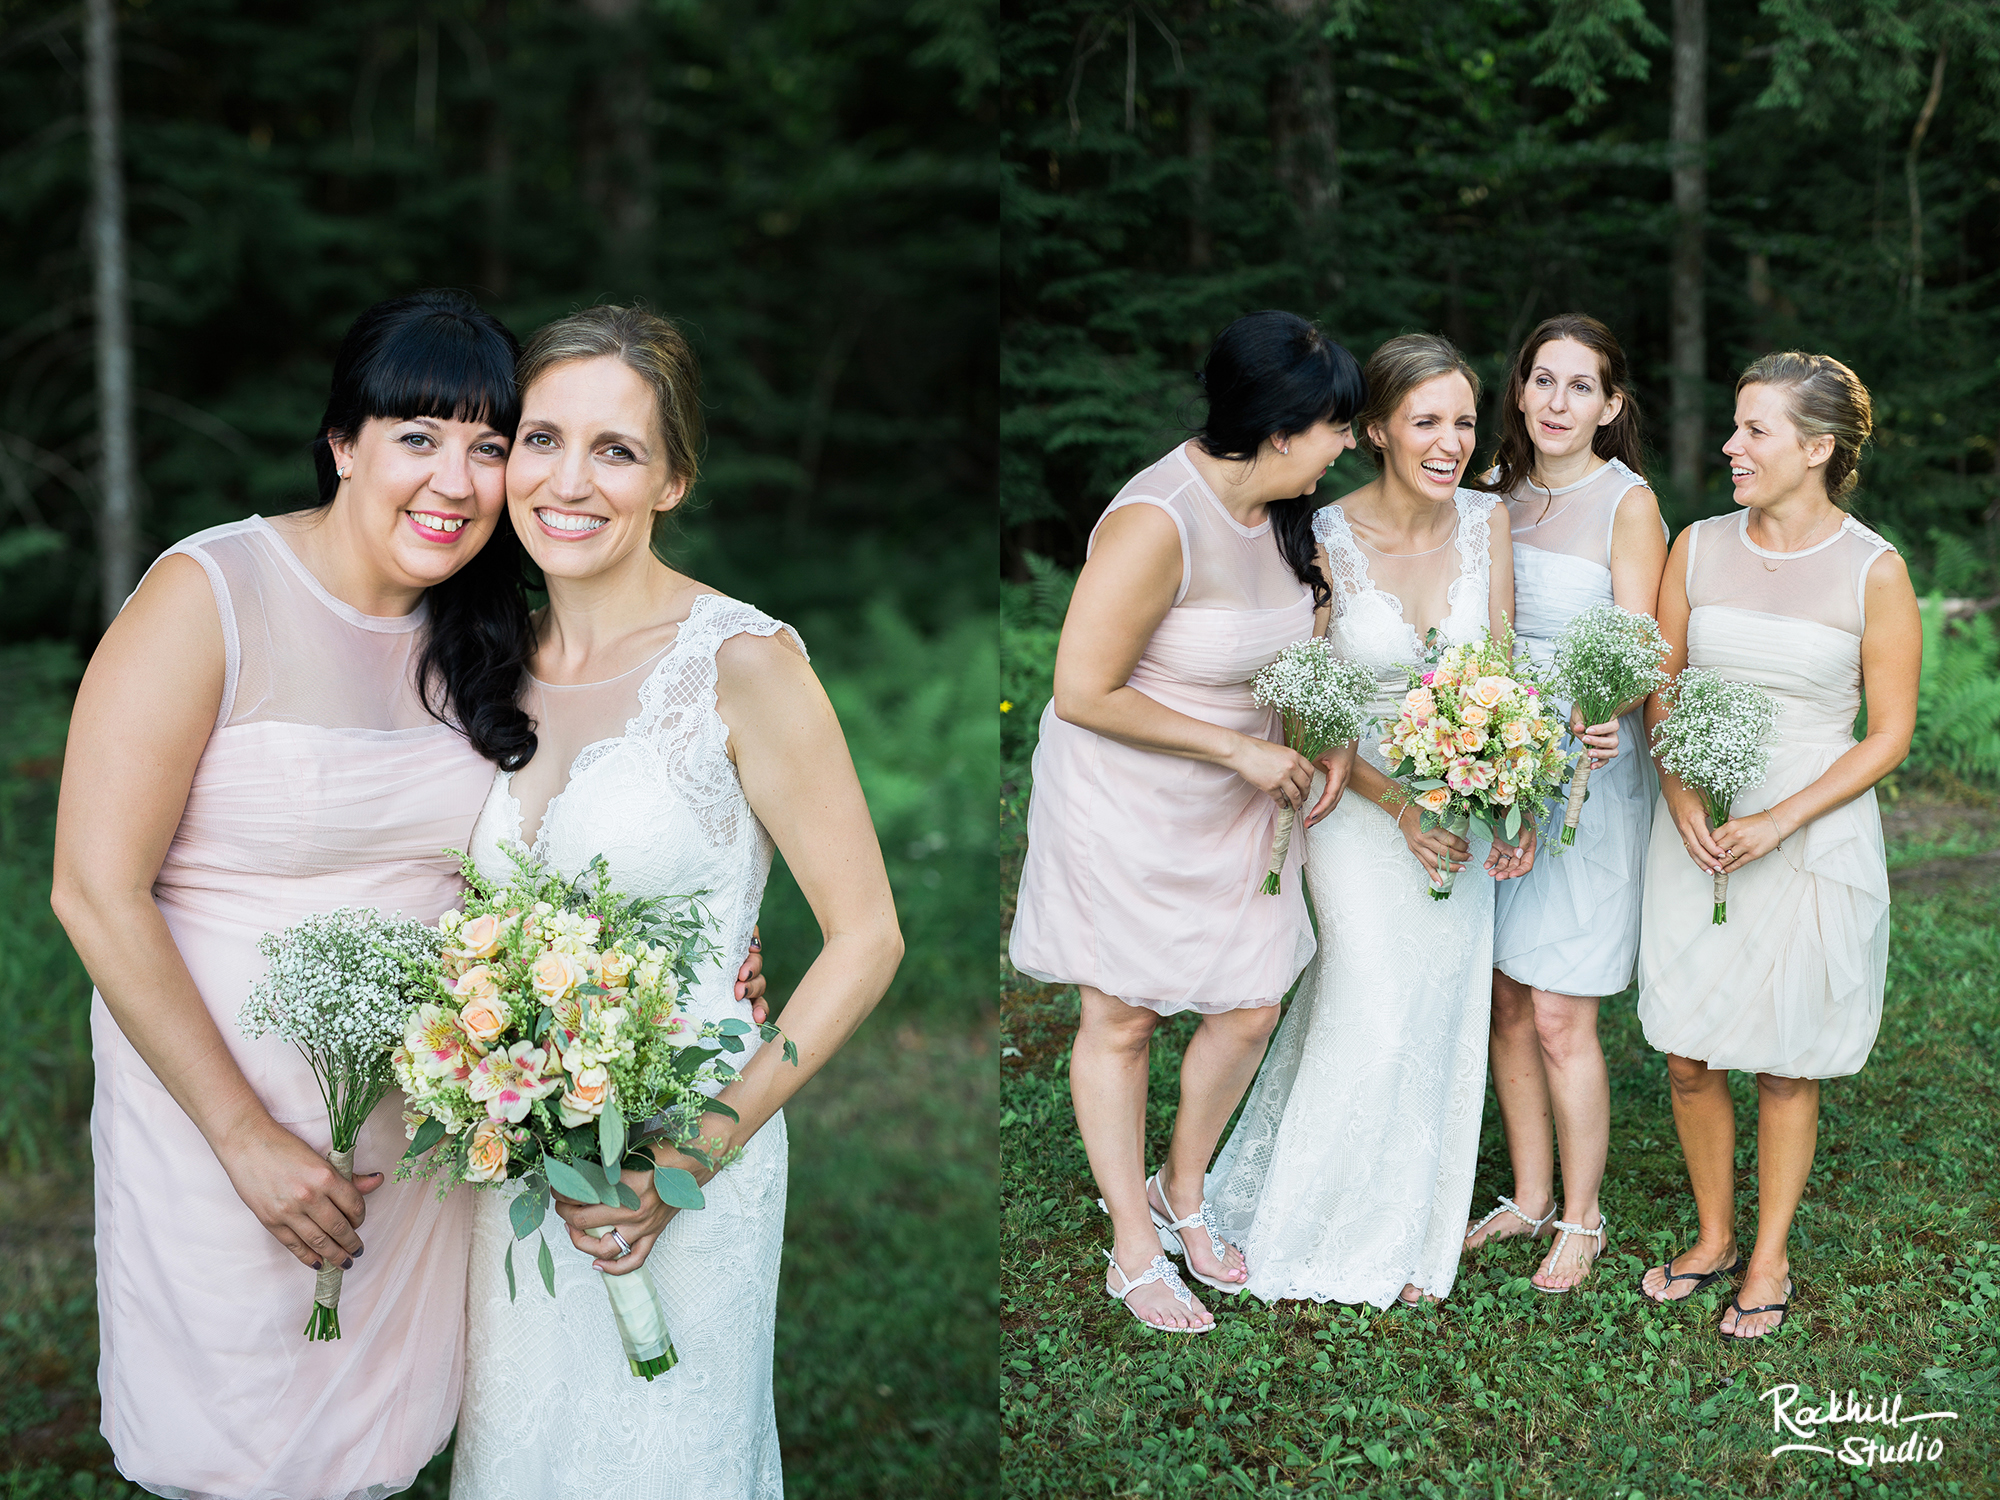 grand-marais-wedding-photography-upper-peninsula-northern-michigan-rockhill-81.jpg